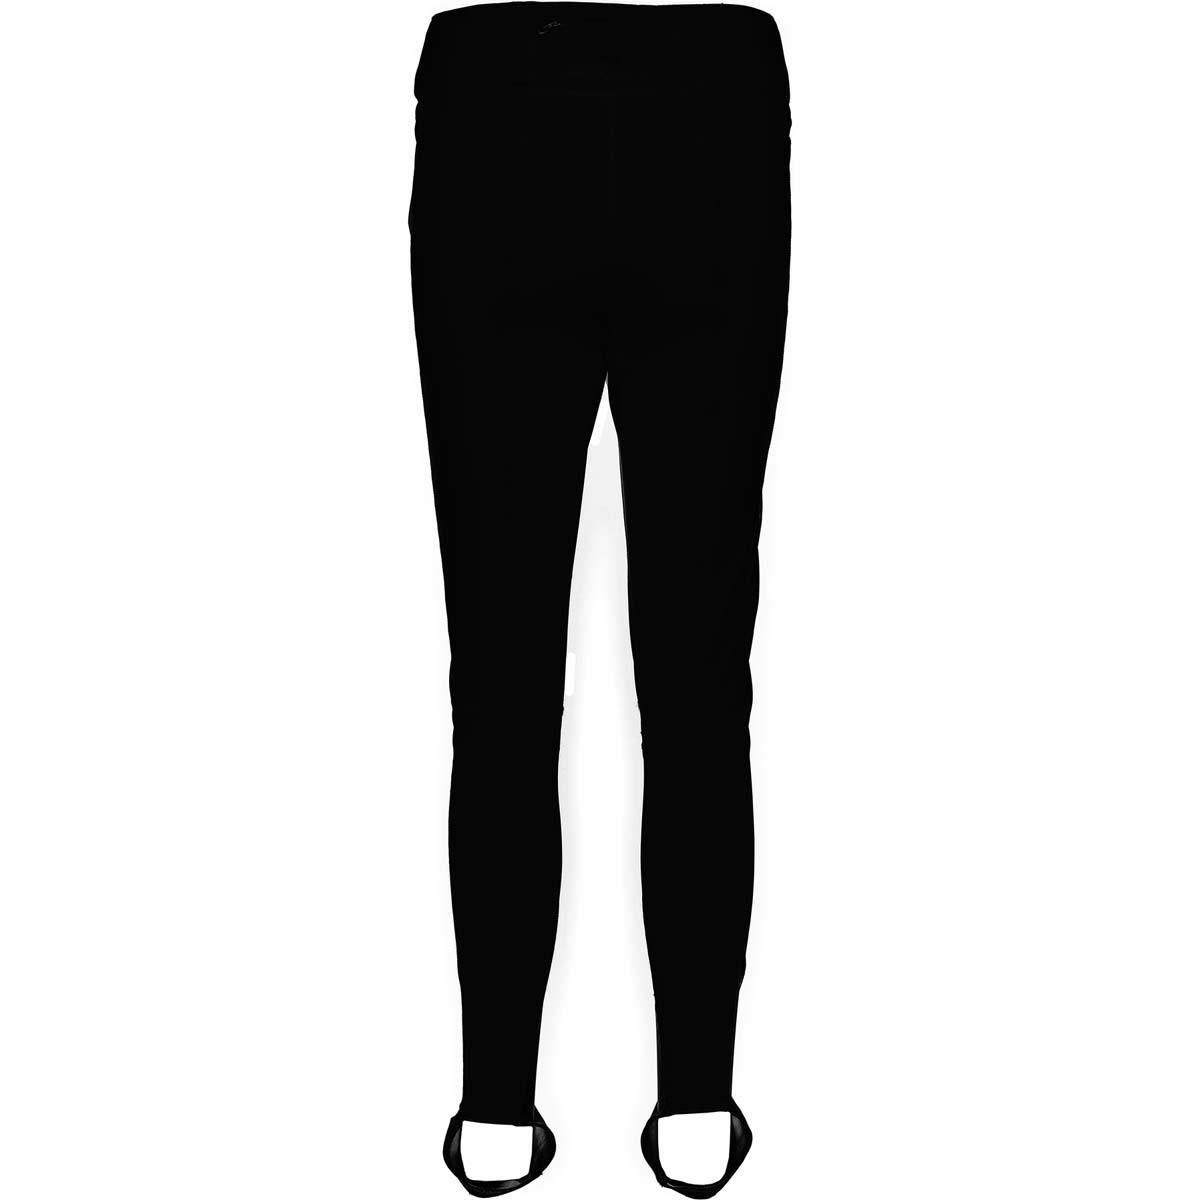 Obermeyer Women's Jinks ITB Pants Black 10 S